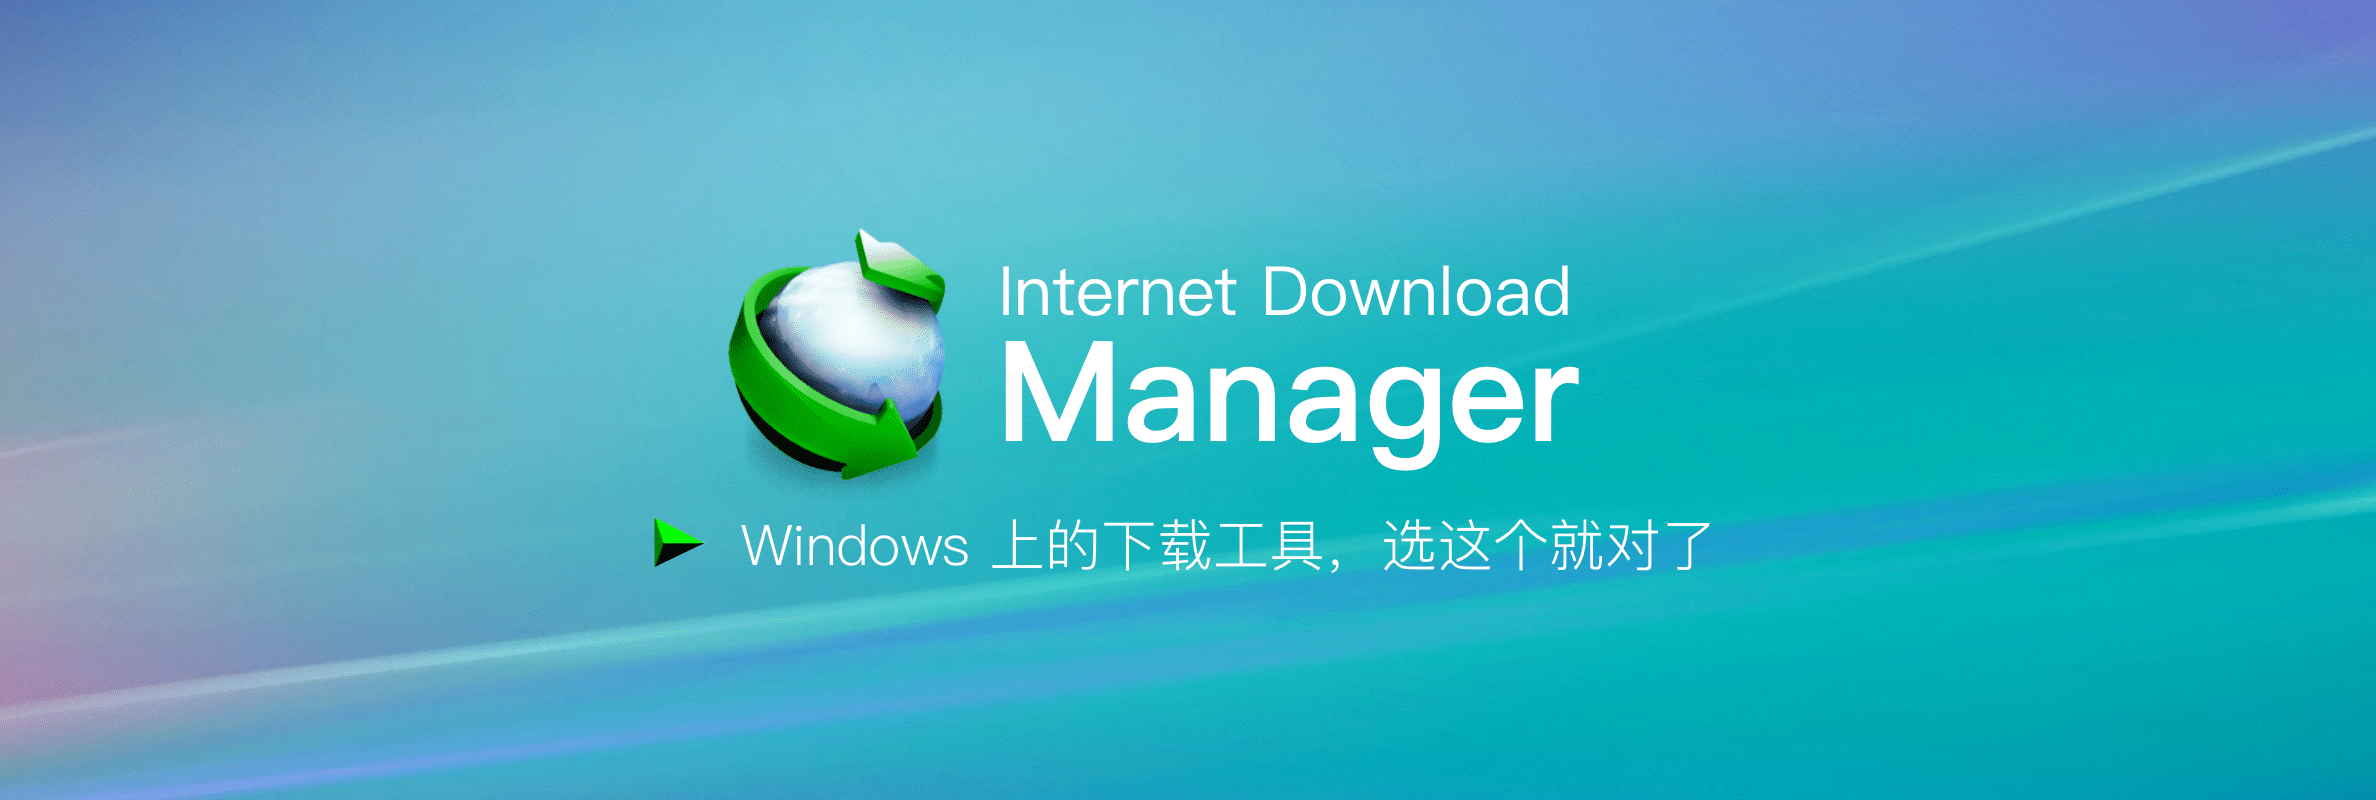 IDM下载器是国内外优秀下载工具,支持IE, Firefox, Chrome等所有浏览器,兼容所有Windows平台。最具特色功能如续传功能,支持恢复因为断线、网络问题、计算机宕机等故障导致中断的下载任务。Internet Download Manager的续传功能可以恢复因为断线、网络问题、计算机当机甚至无预警的停电导致下传到一半的软件。